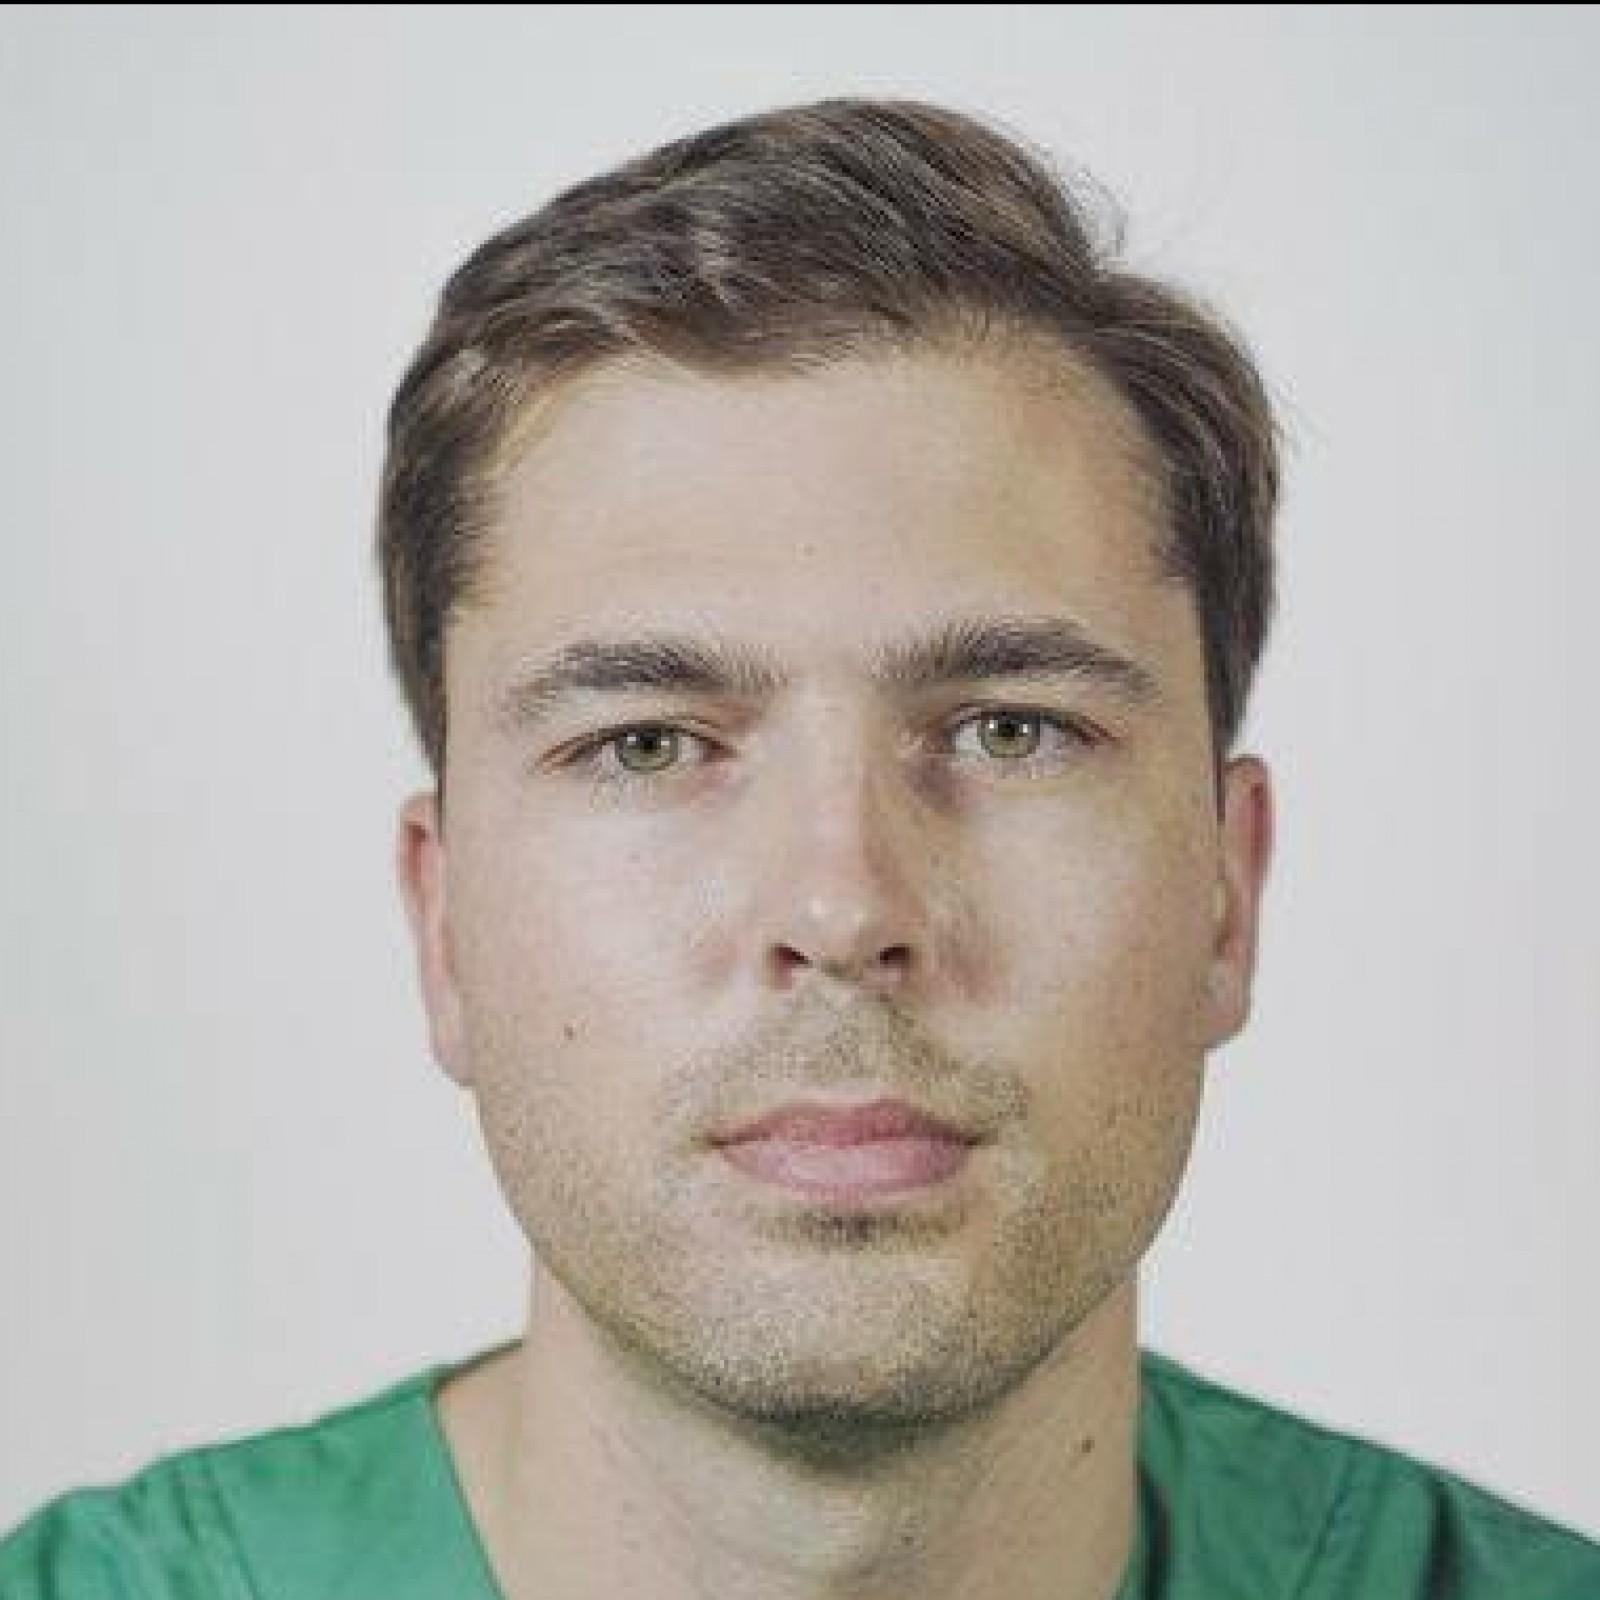 Prof. Karel Decaestecker, MD, PhD